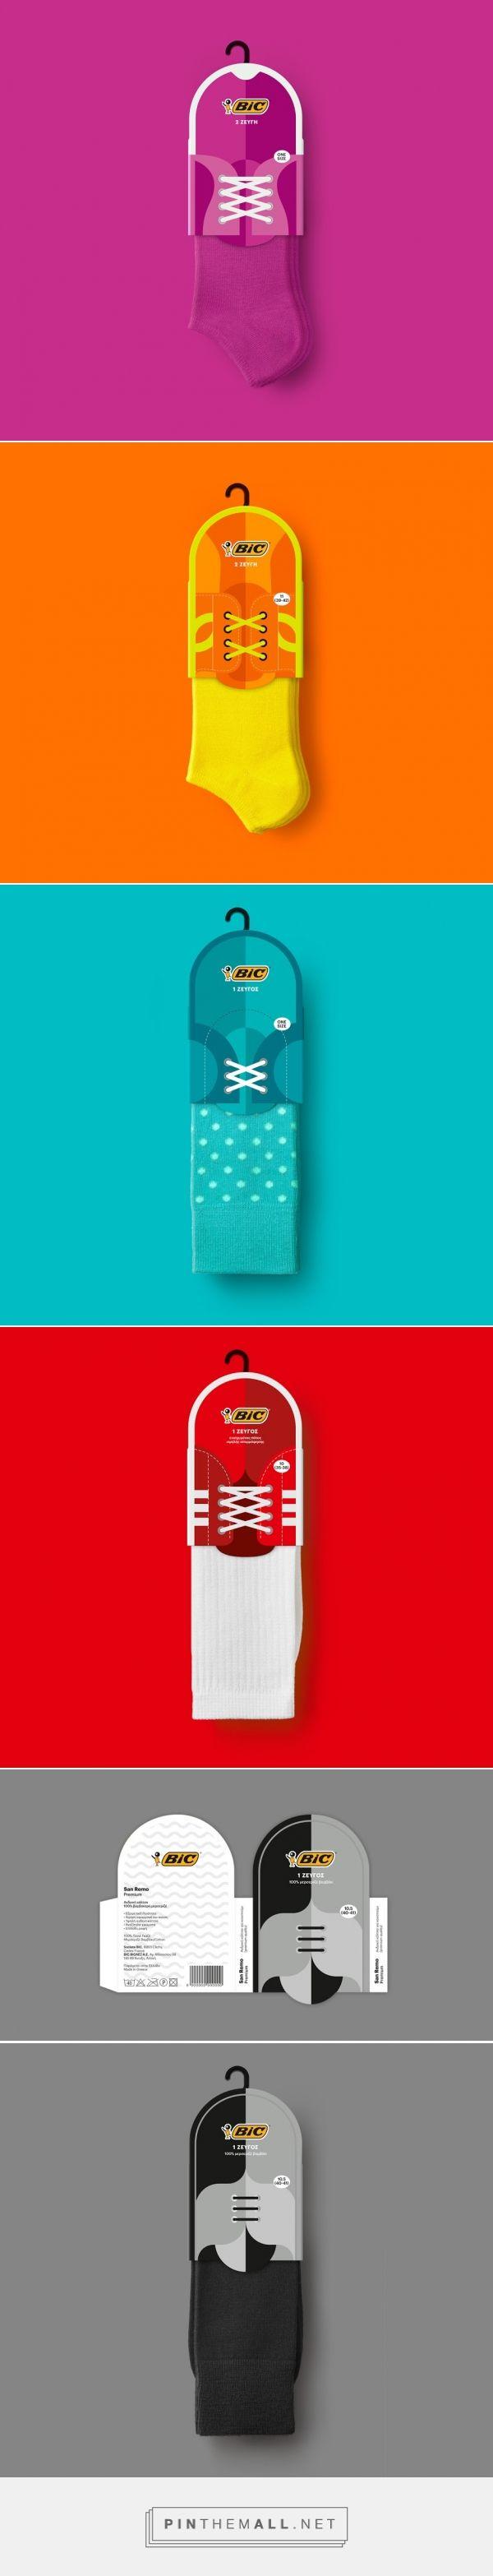 Bic #Socks #Packaging #Design by Mousegraphics (#Greece) - http://www.packagingoftheworld.com/2016/05/bic-socks.html